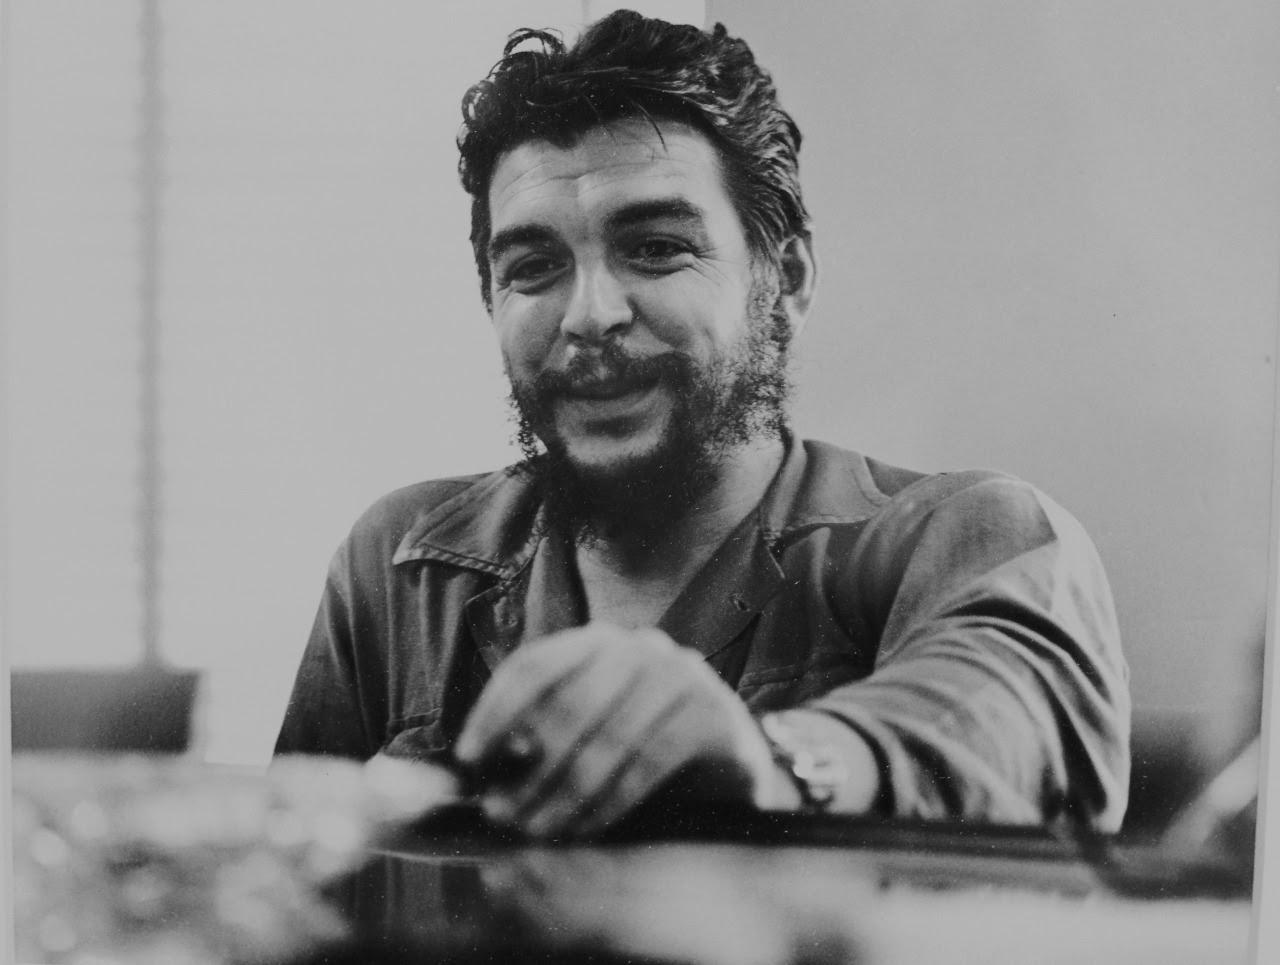 Llega la Revolución Cubana a Tlalpan